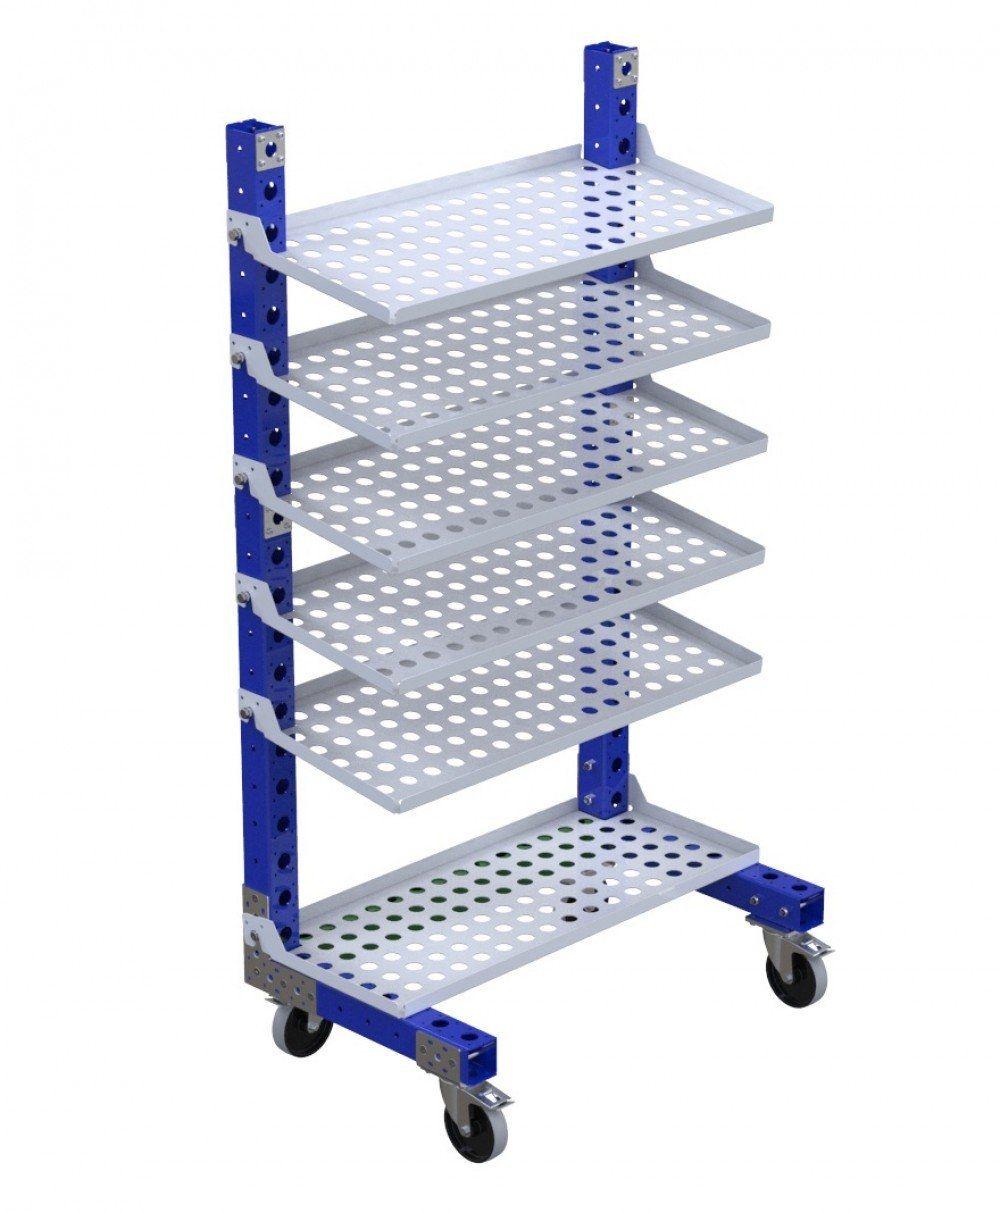 Material handling removable flow shelf cart by FlexQube